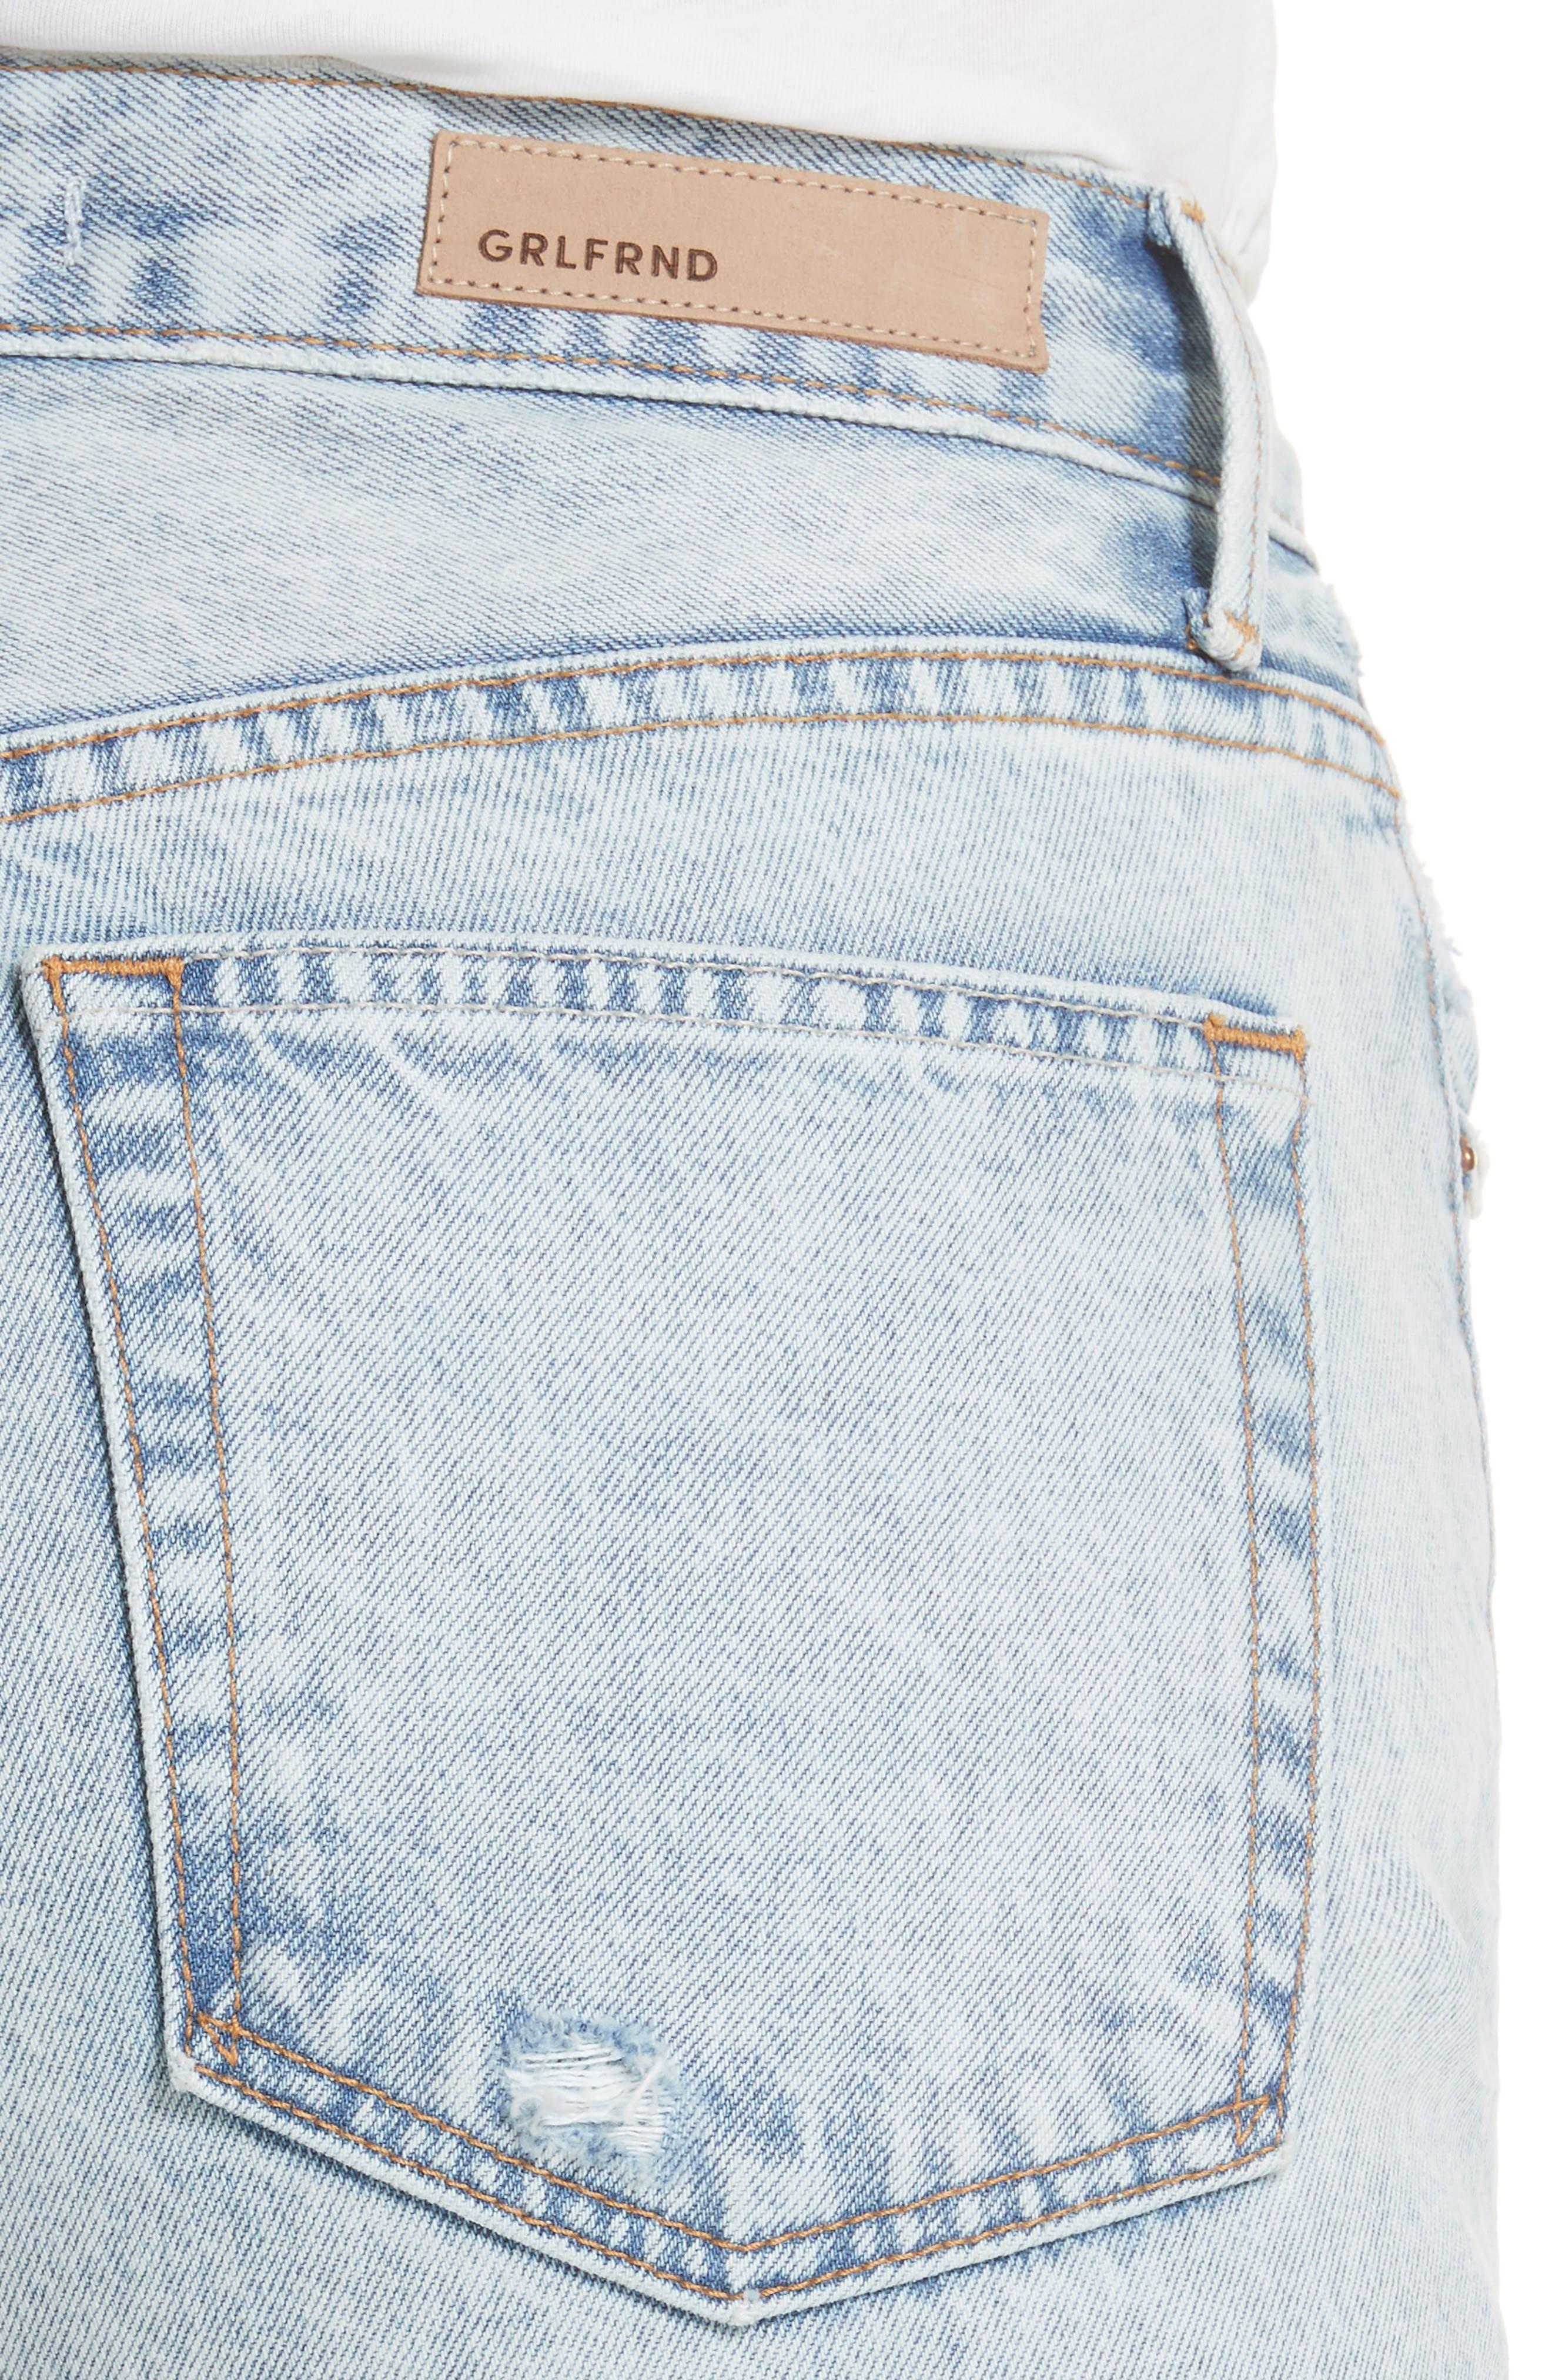 Karolina Ripped Skinny Jeans,                             Alternate thumbnail 4, color,                             Reactive